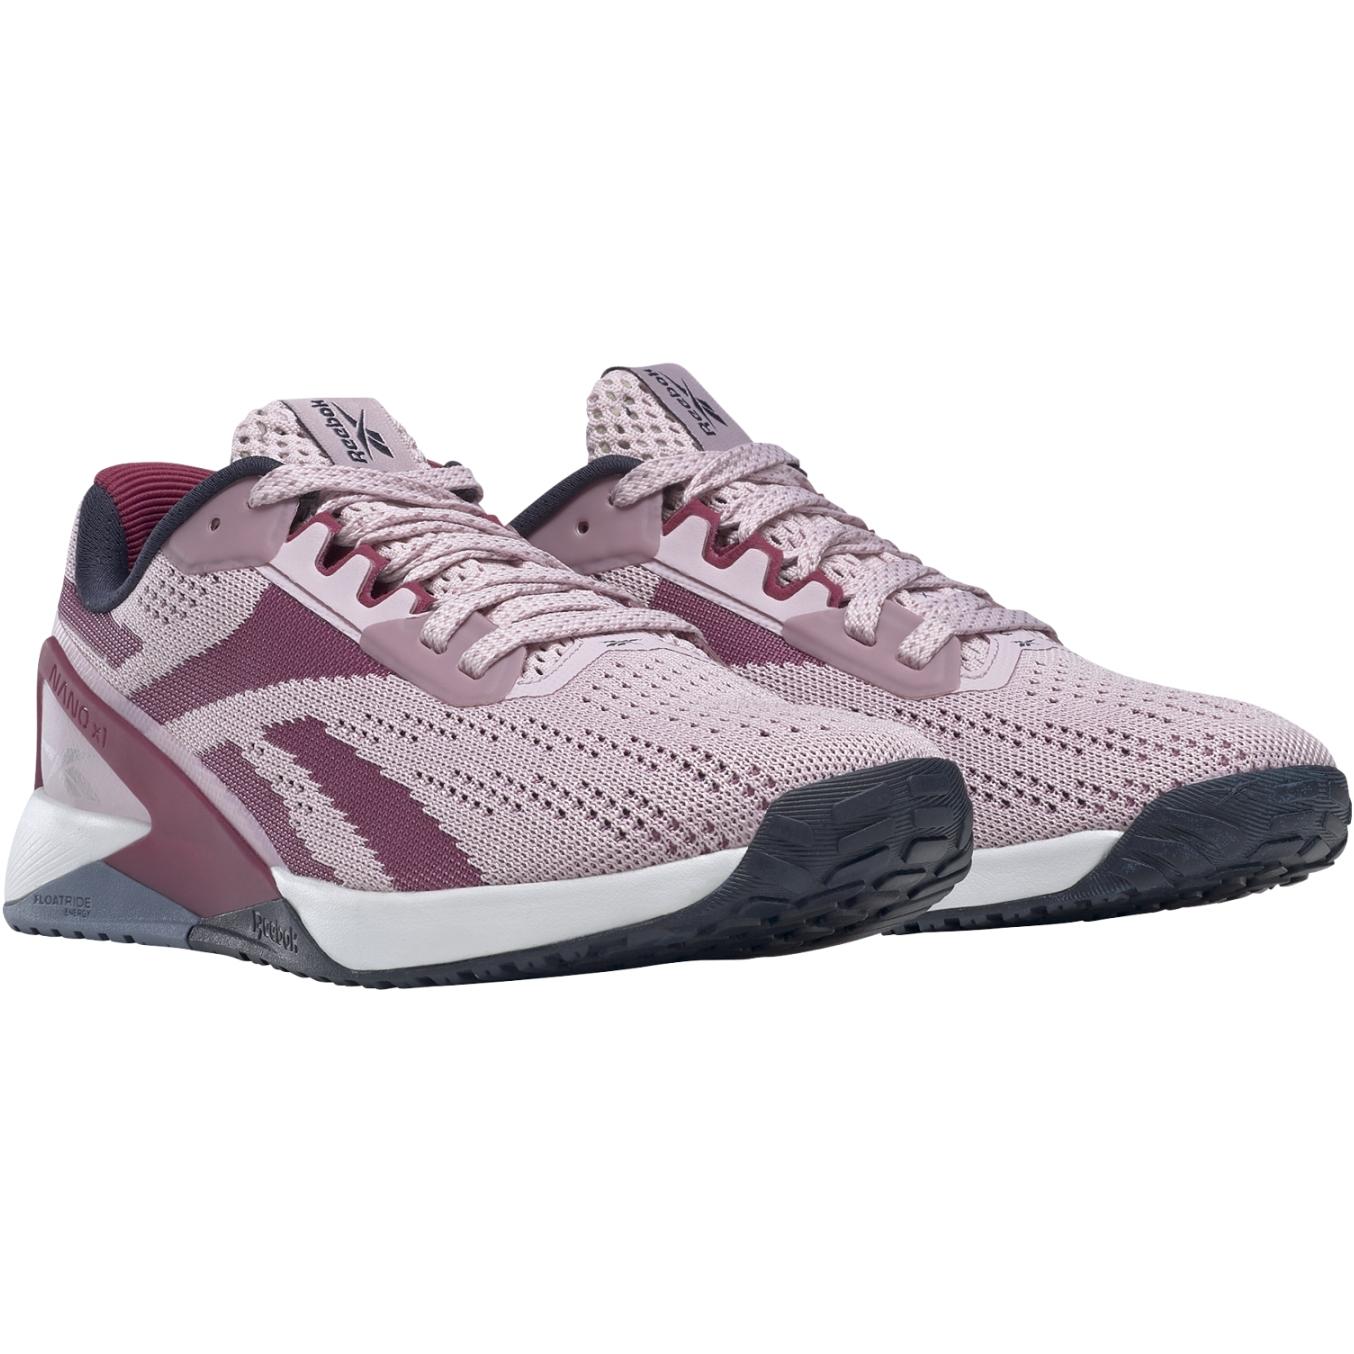 Reebok Nano X1 Women's Shoes - frost berry/punch berry/vector navy